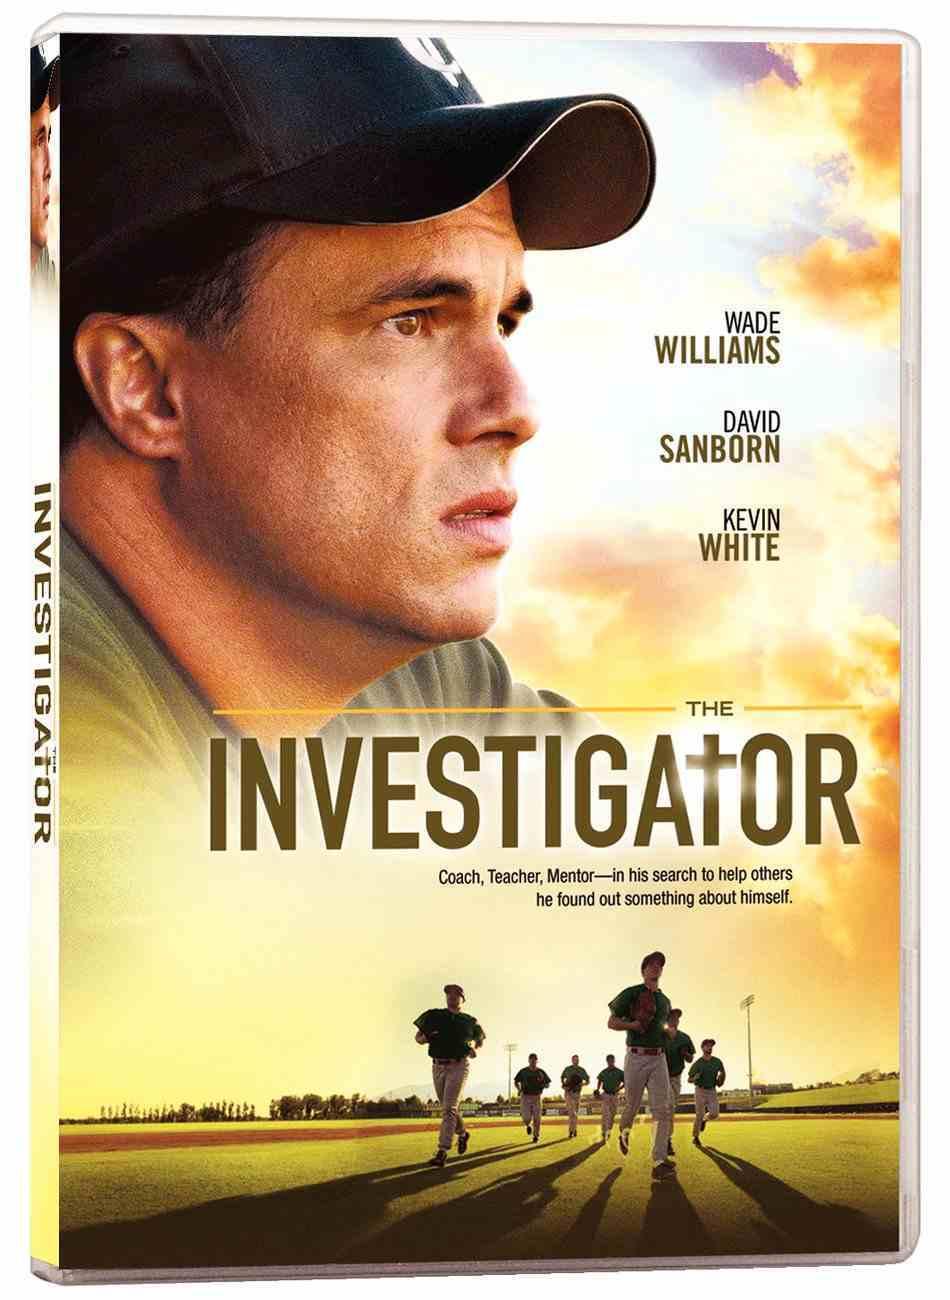 The Investigator DVD